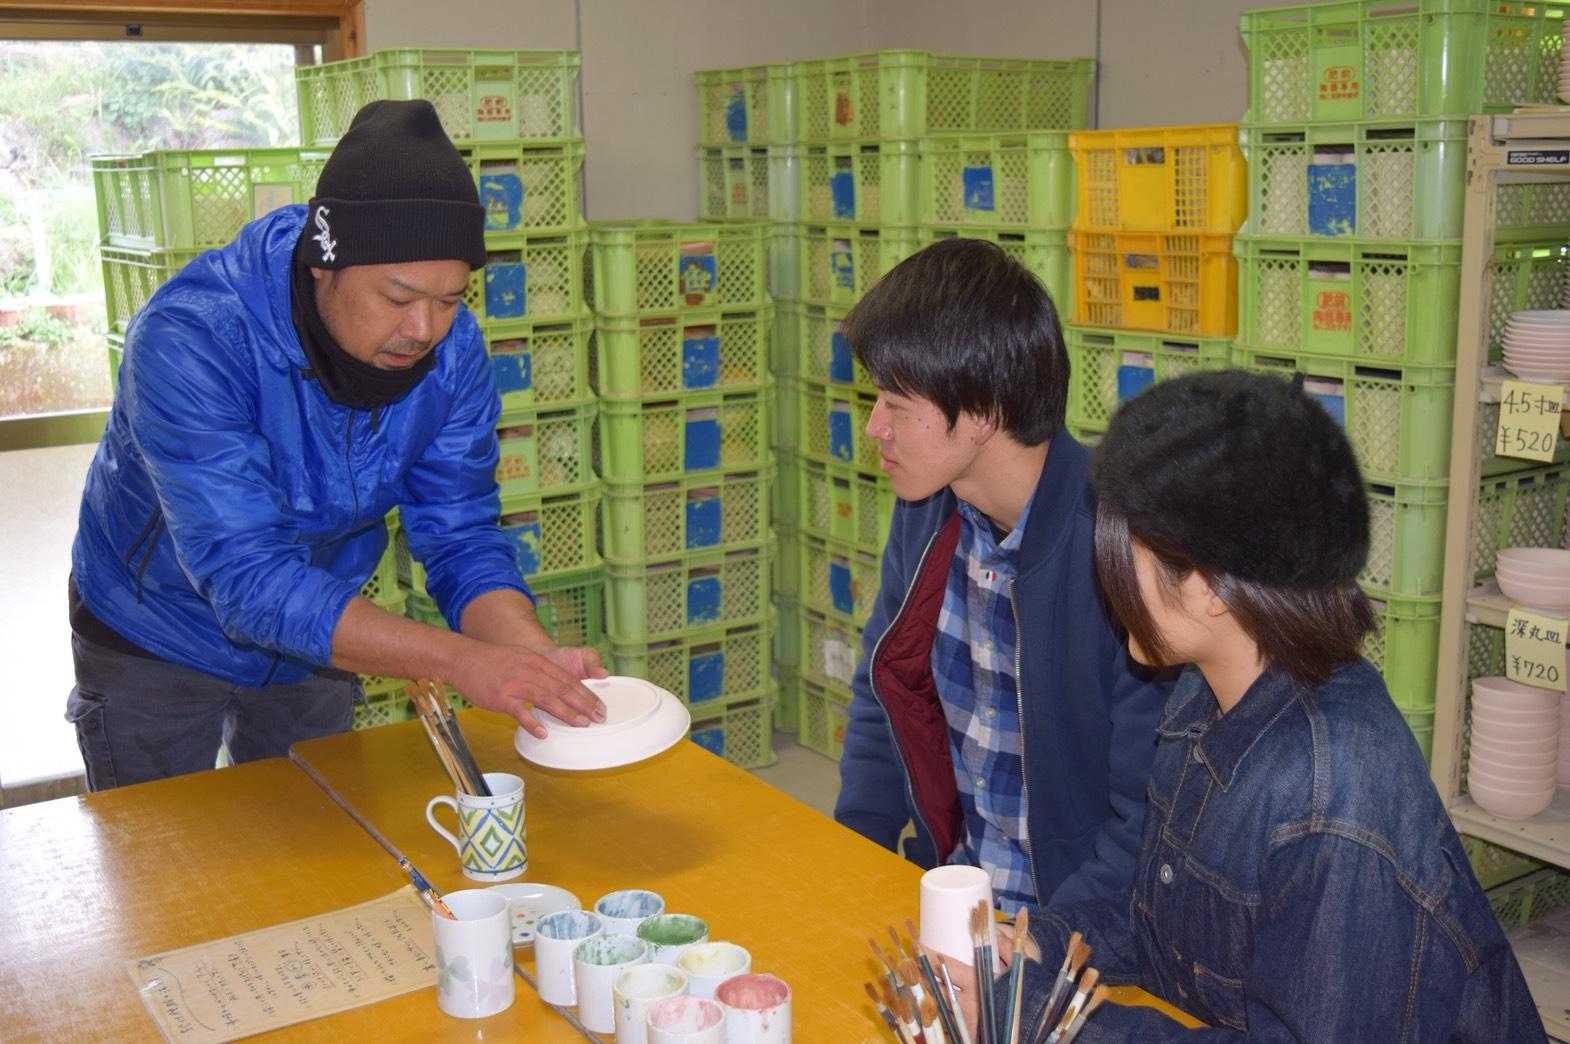 内田皿山焼‗絵付け体験